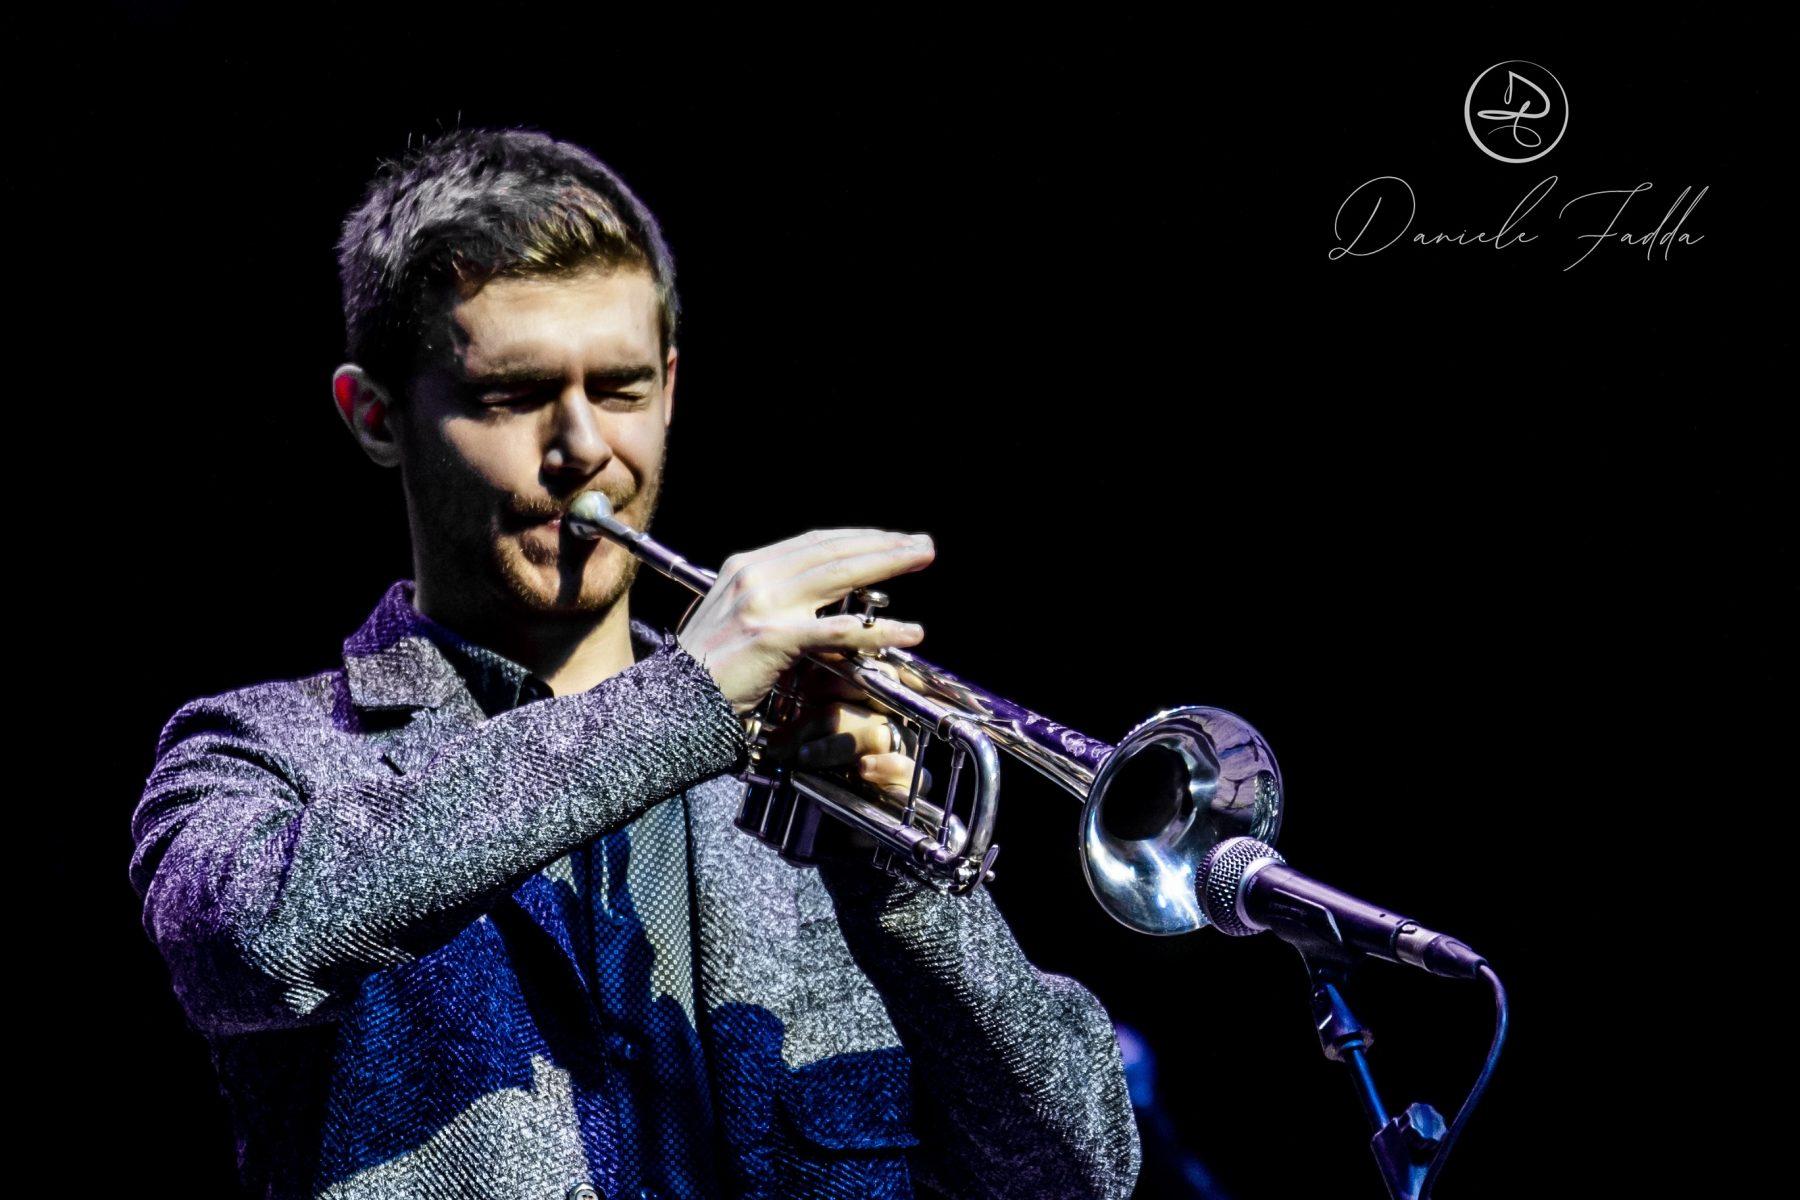 European Jazz Expo - Growin' Jazz - Daniele Fadda - 2019 - Sa Scena Sarda - 2 Novembre